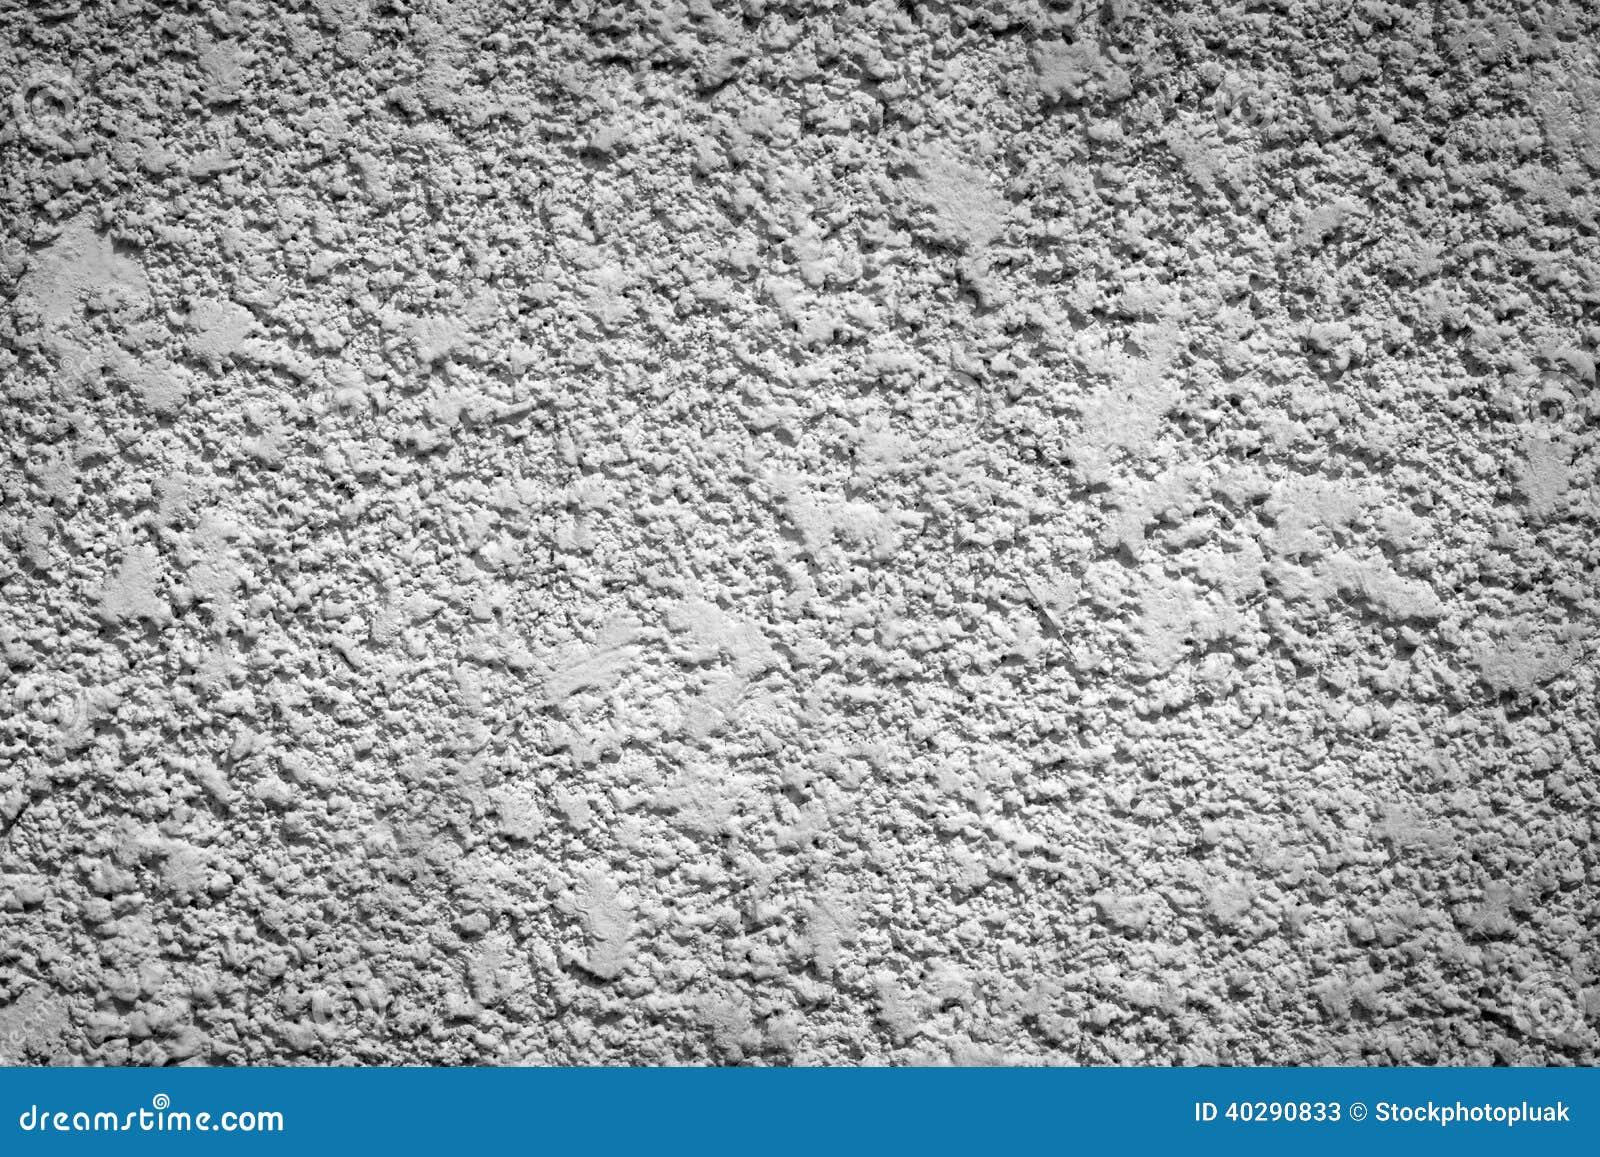 Постаретая предпосылка стены улицы, старая предпосылка текстуры красного кирпича